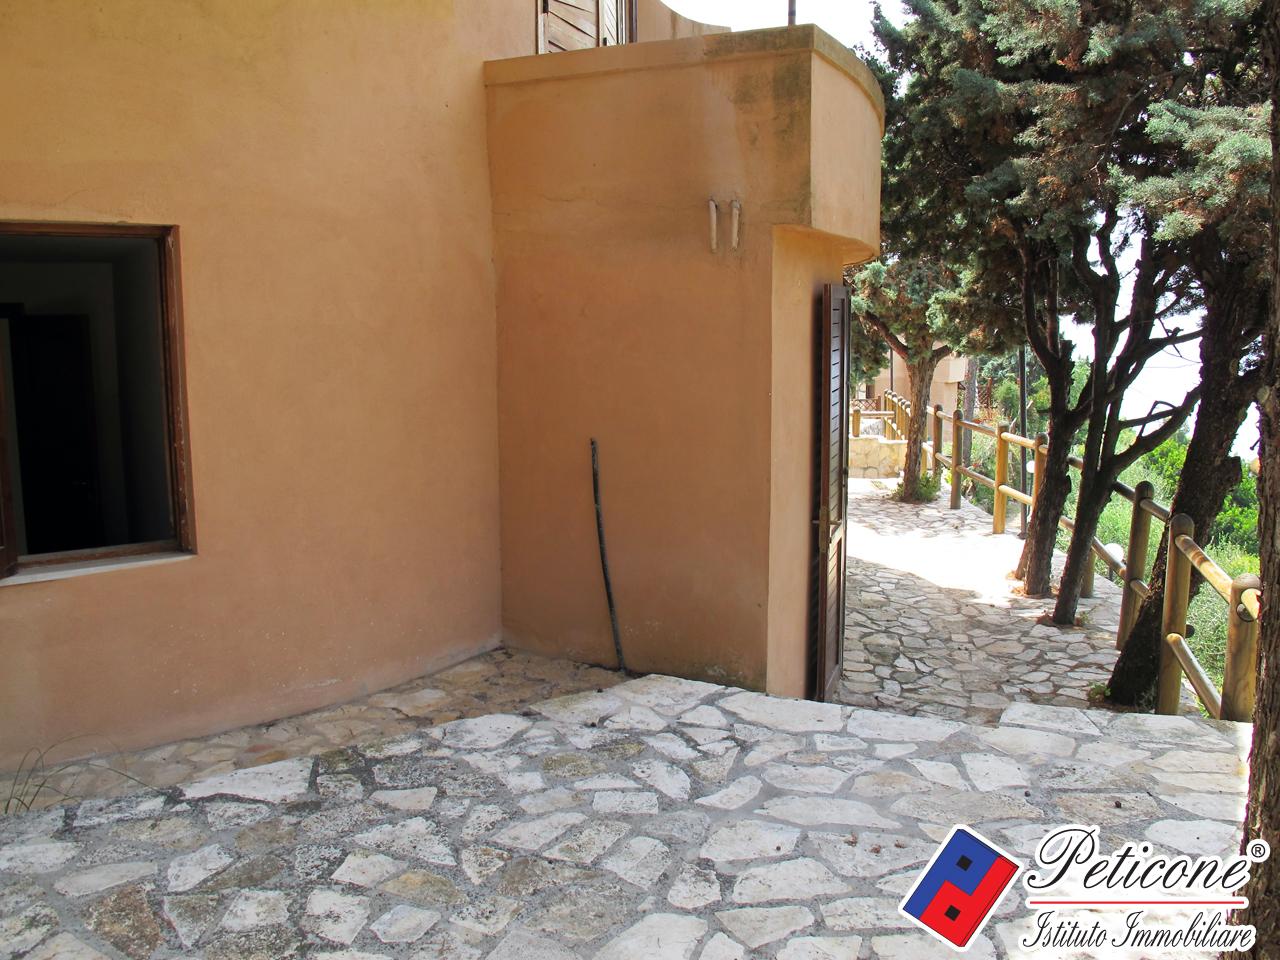 Appartamento in Vendita a Sperlonga: 1 locali, 45 mq - Foto 4